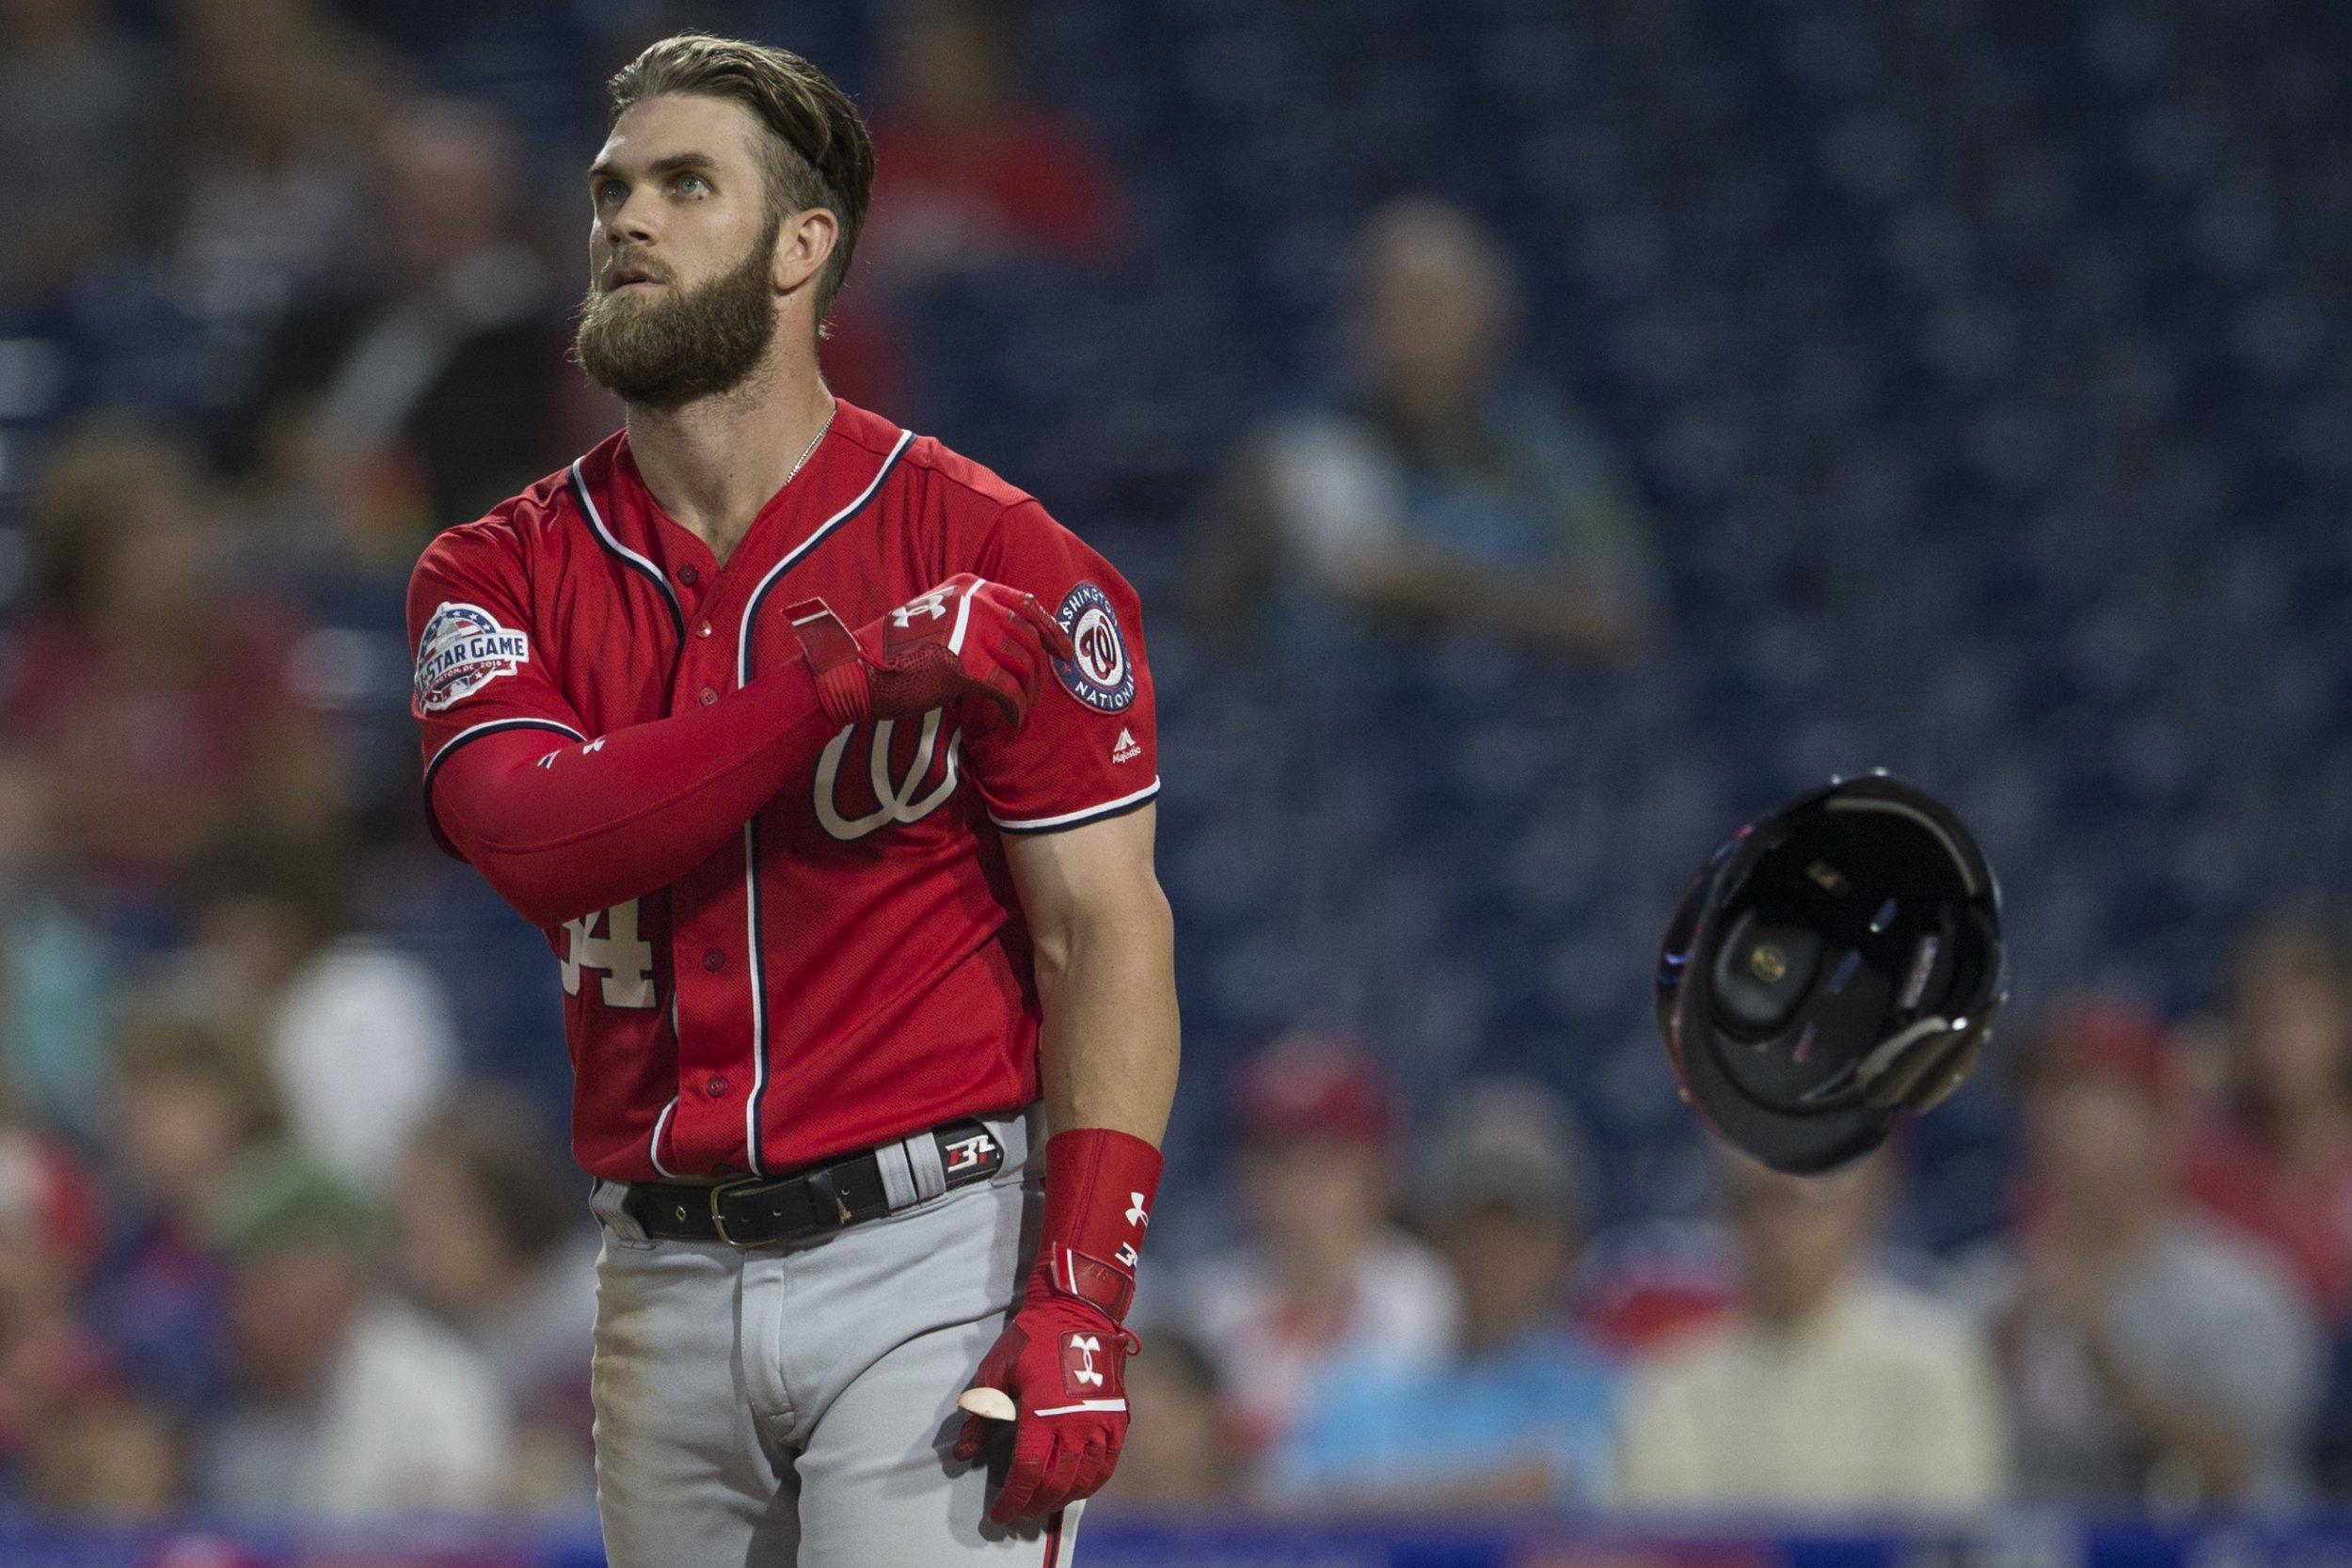 c15a66198 MLB Free Agency Rumors  Latest on Bryce Harper